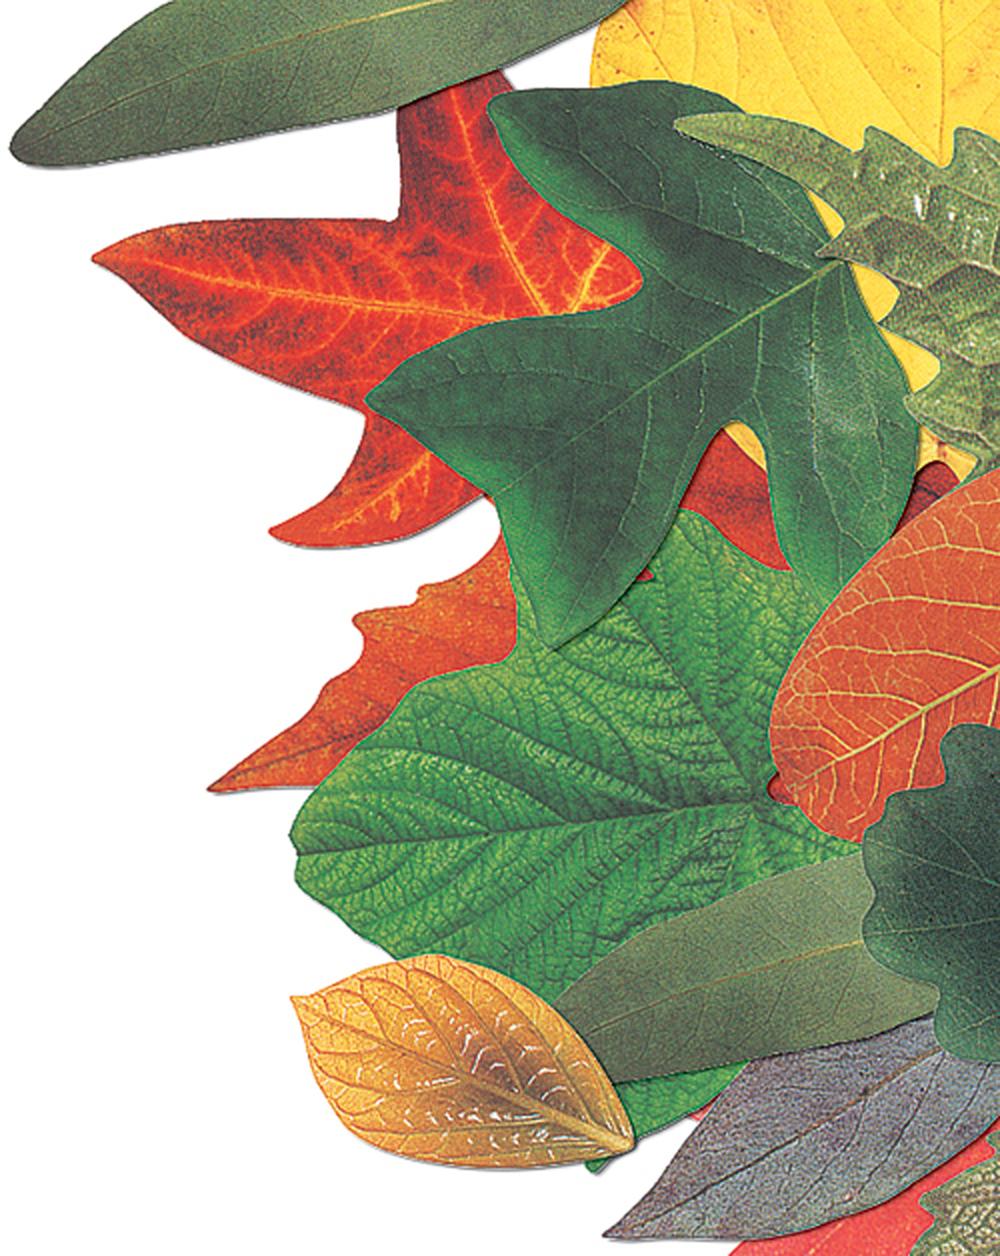 Dye-Cut Leaves, Seeds, & Acorns